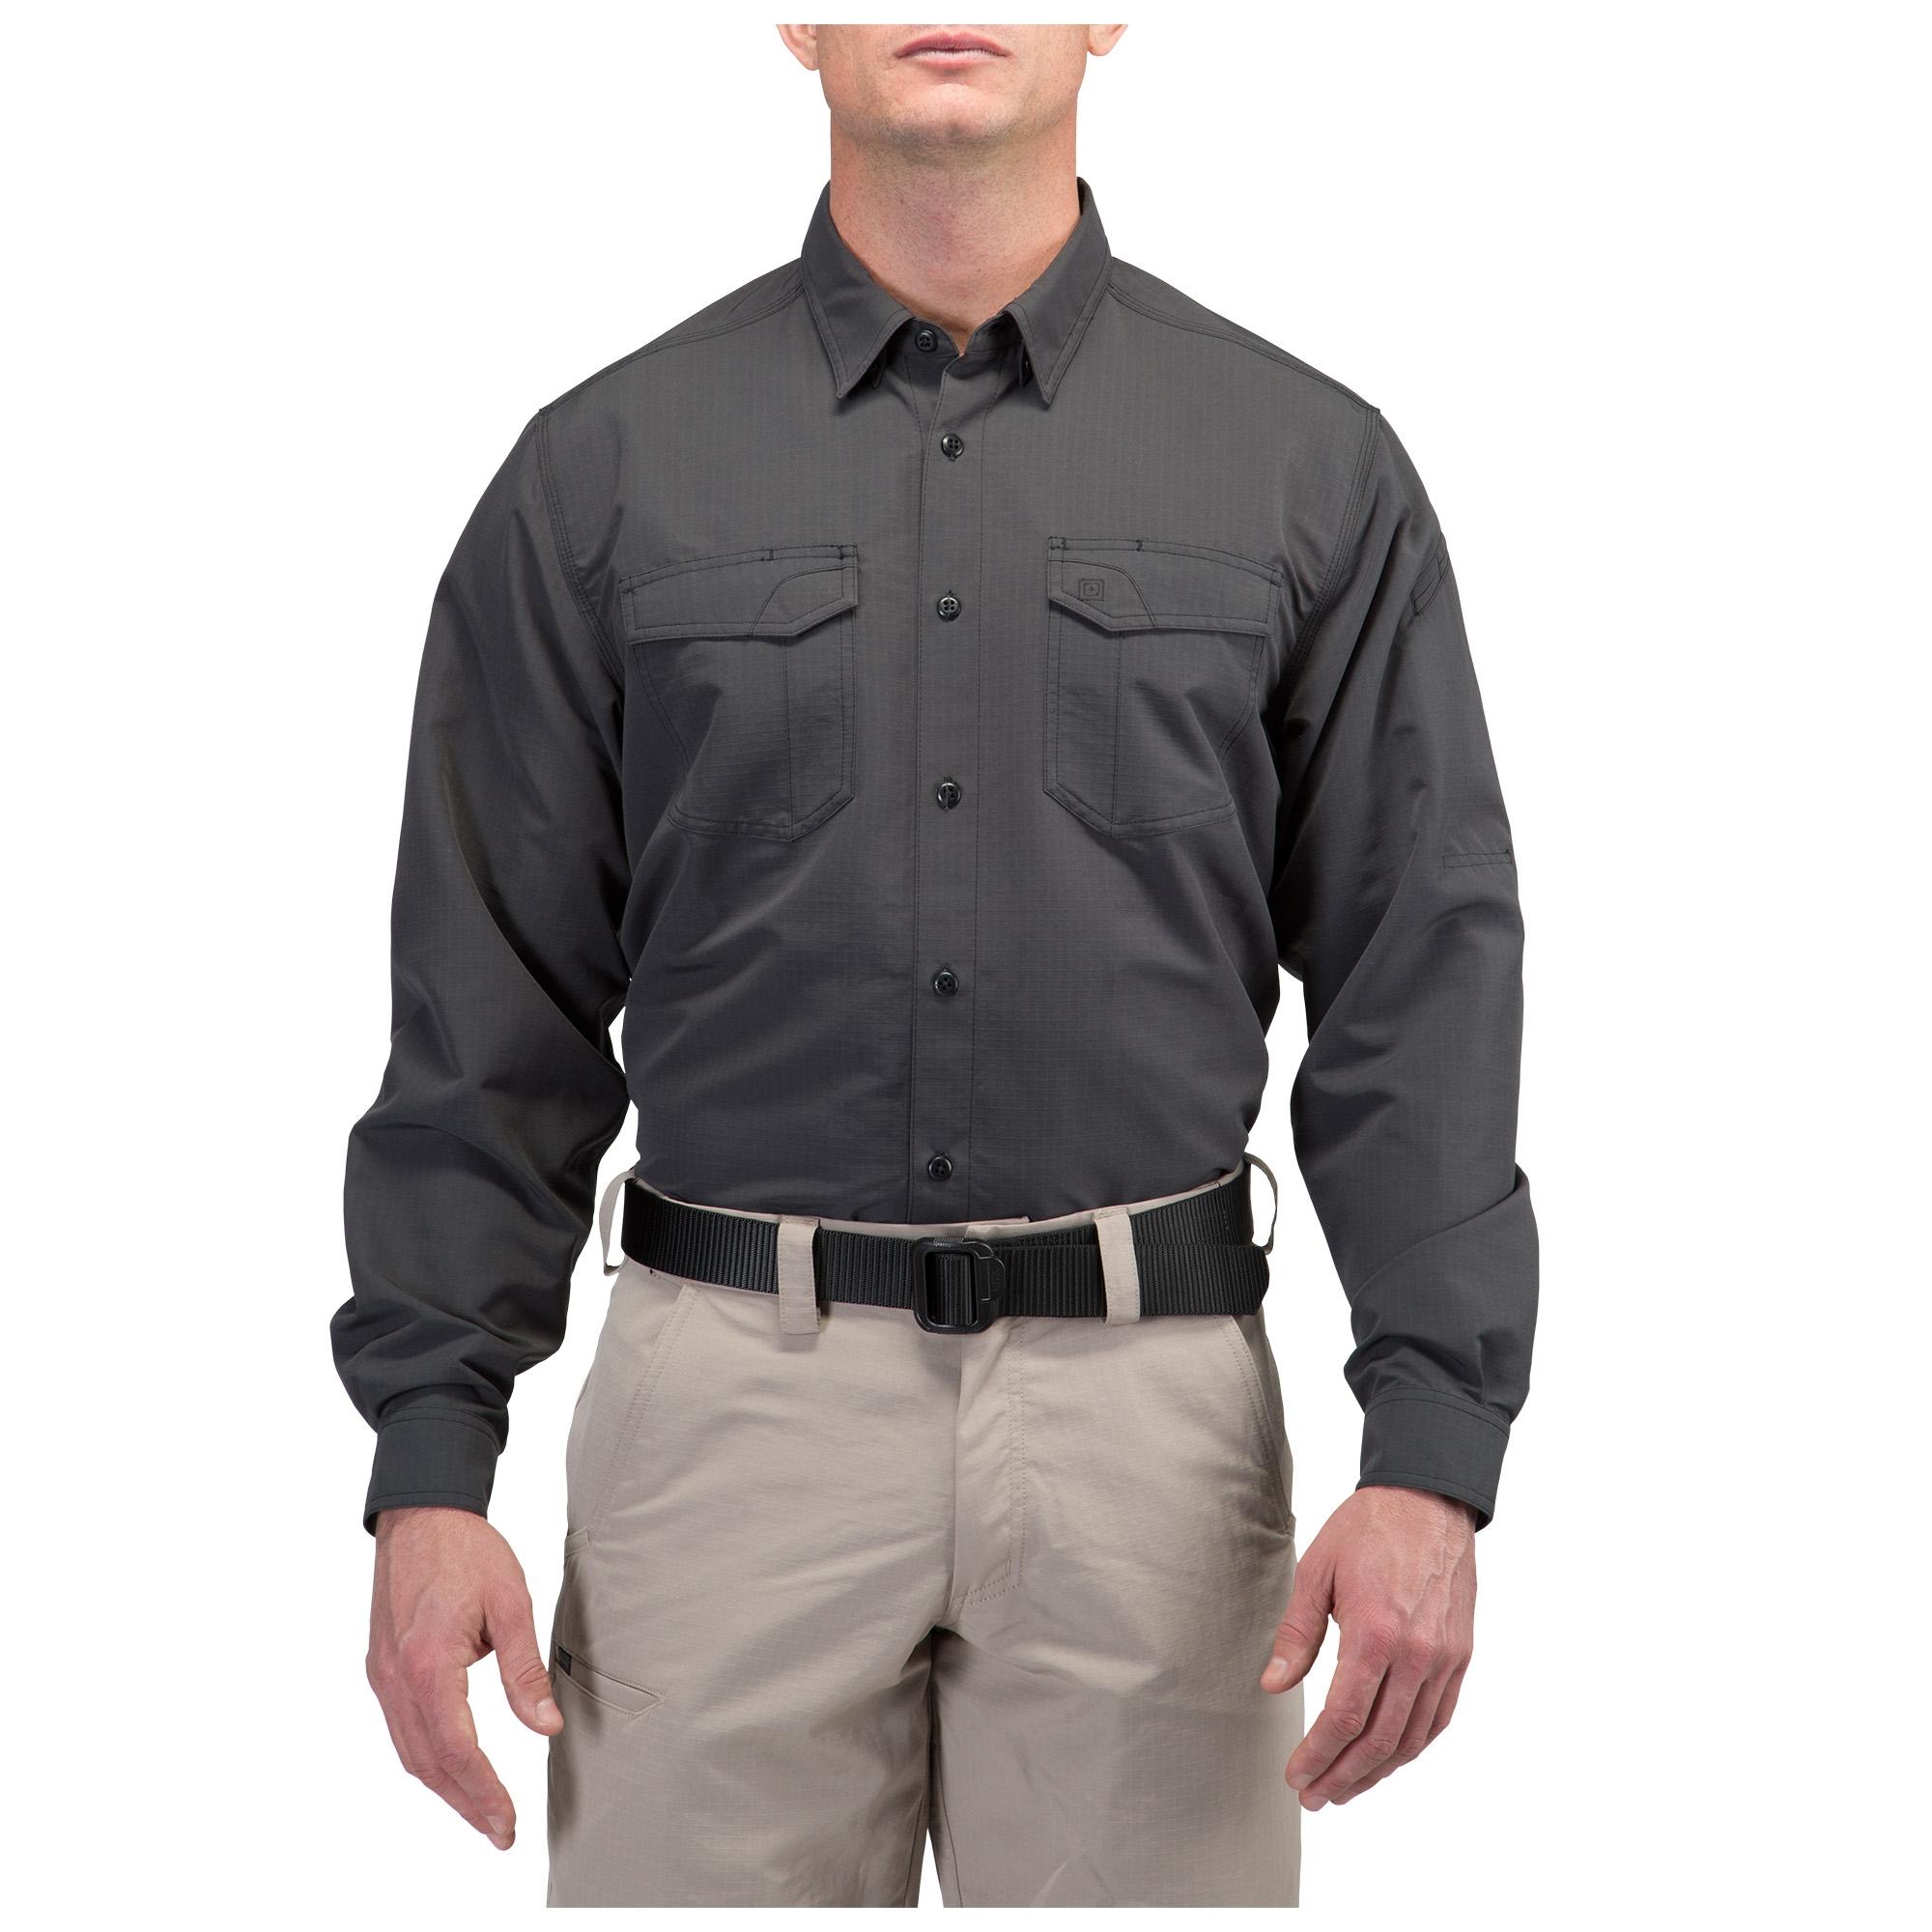 4feefe6d89b6a Buy 5.11 Tactical Mens Fast-Tac™ Long Sleeve Shirt - 5.11 Tactical ...